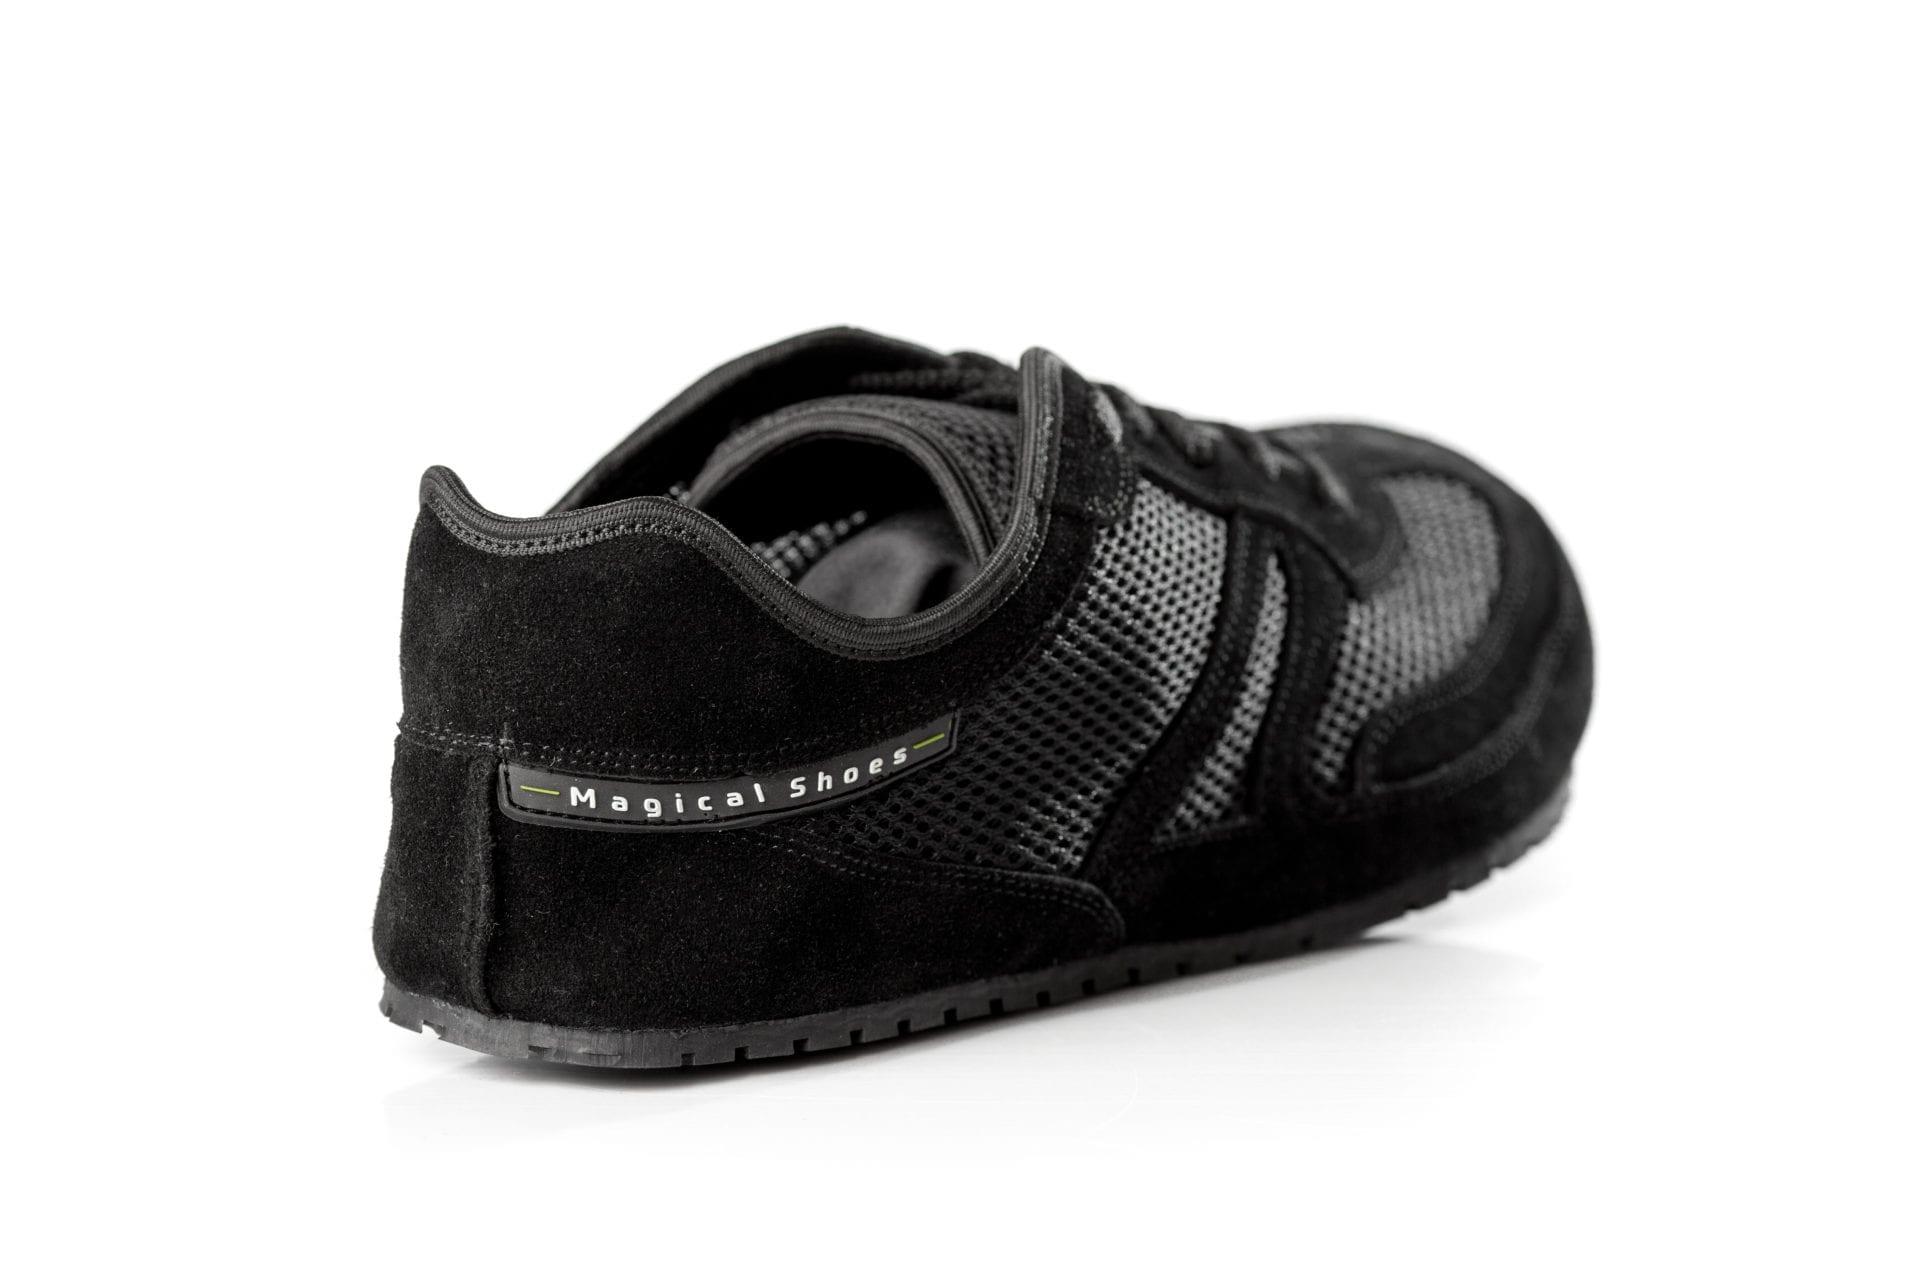 Magical Shoes BAREFOOT SHOES EXPLORER CLASSIC BLACK KIDS picture 2